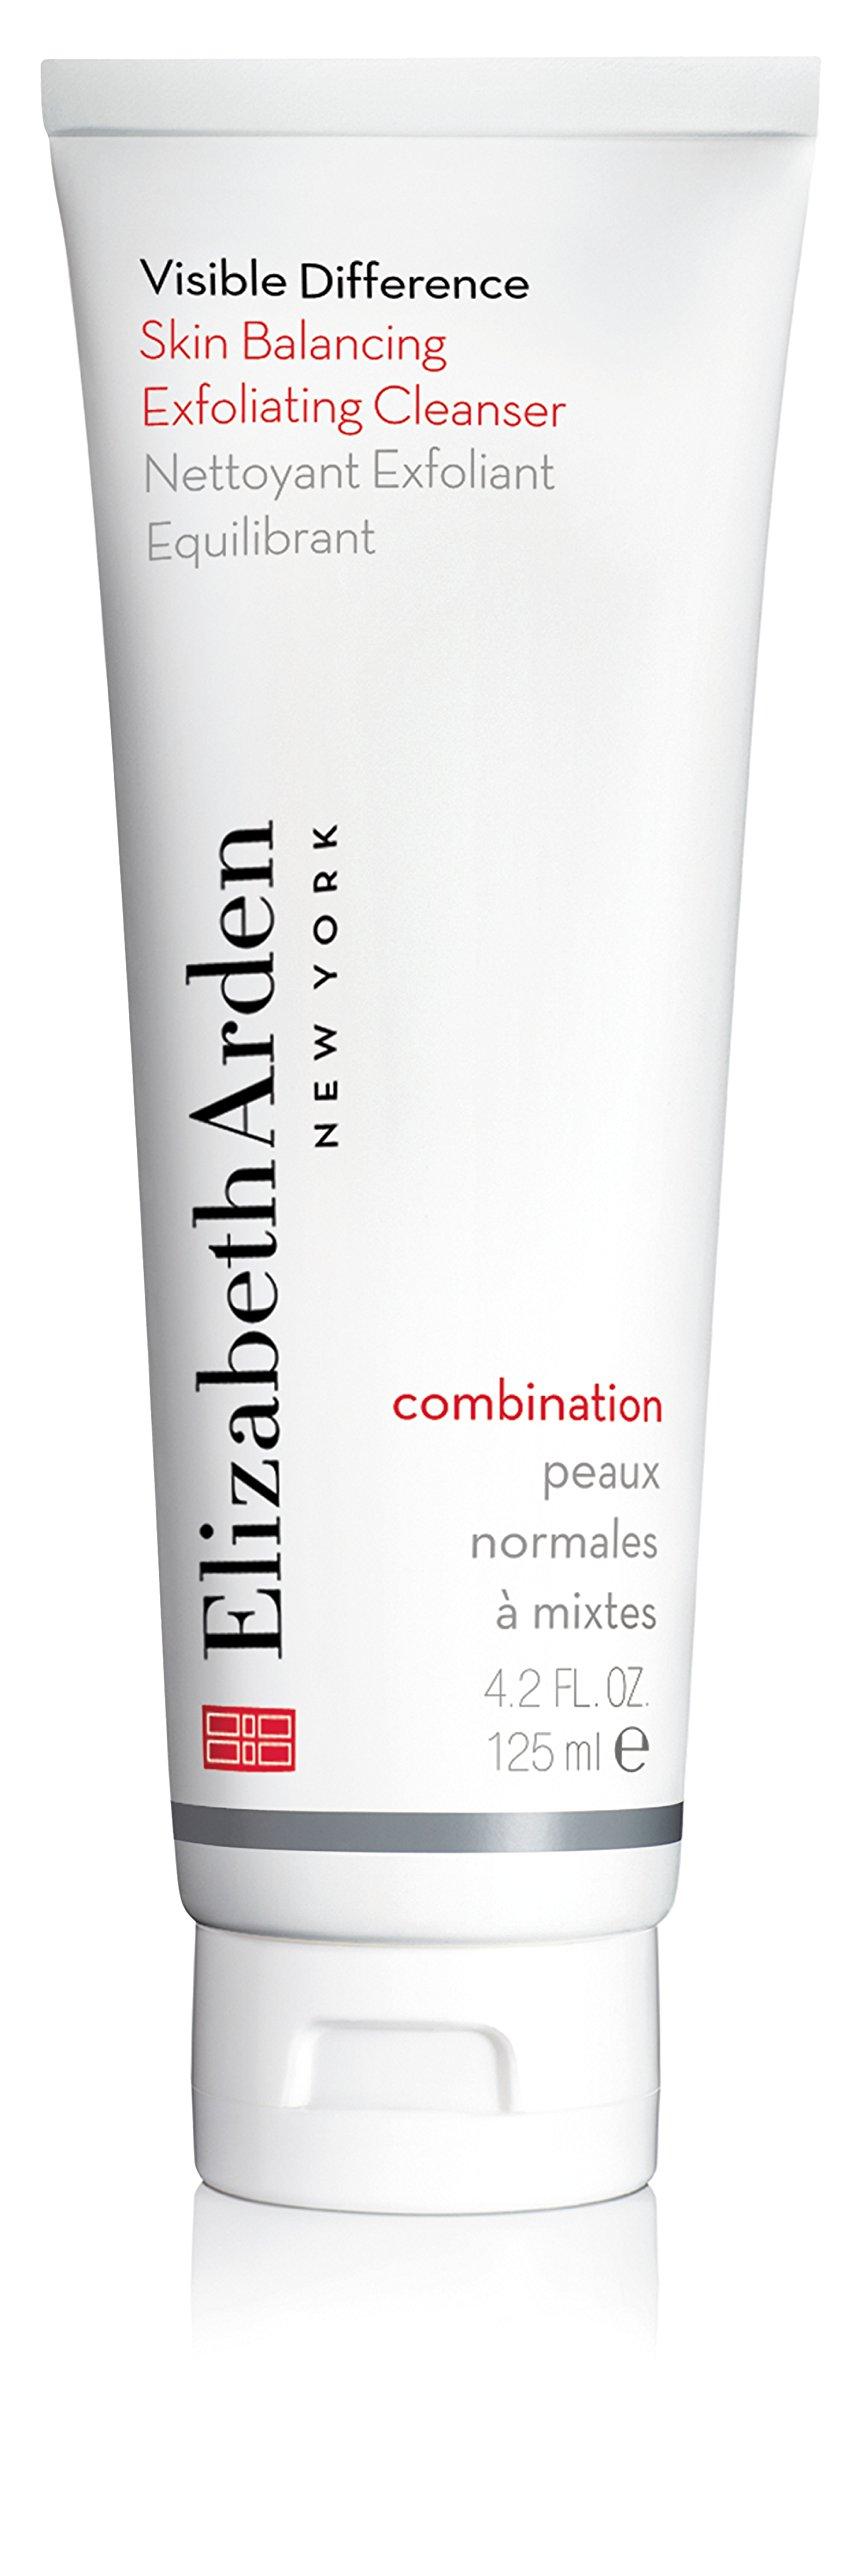 Elizabeth Arden Visible Difference Skin Balancing Exfoliating Cleanser, 4.2 oz